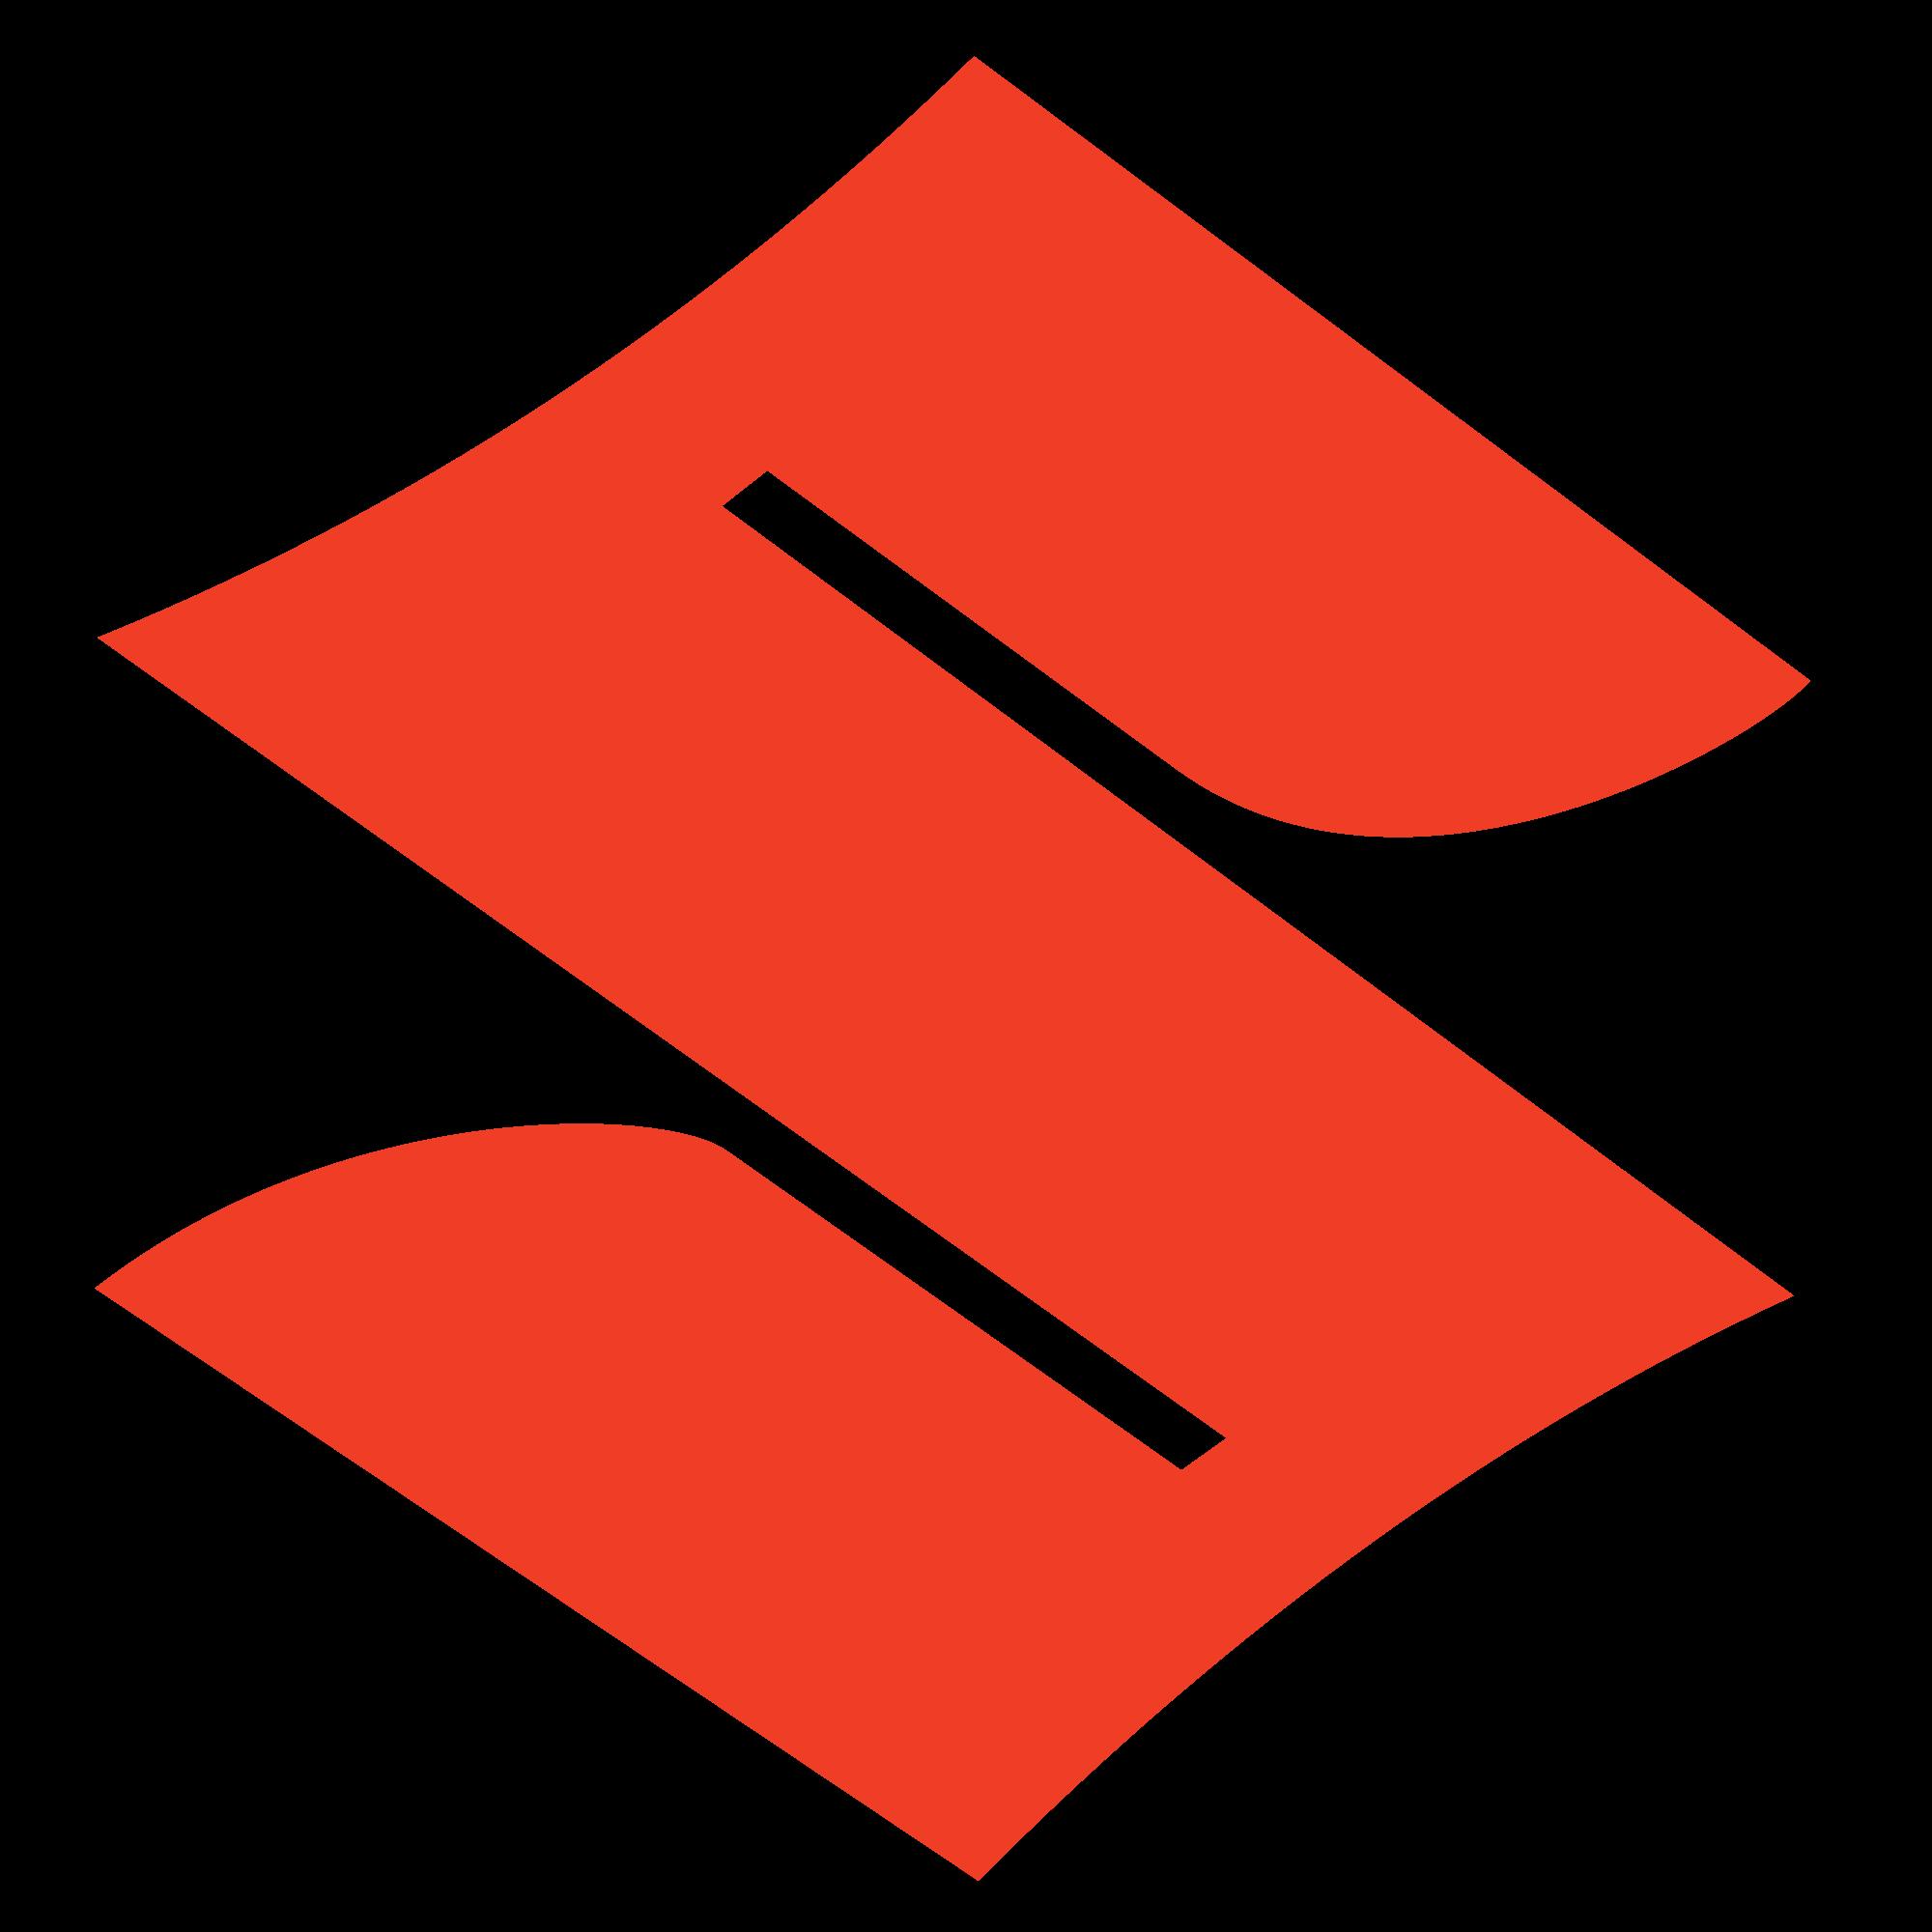 Download Image PlusPng.com  - Suzuki PNG